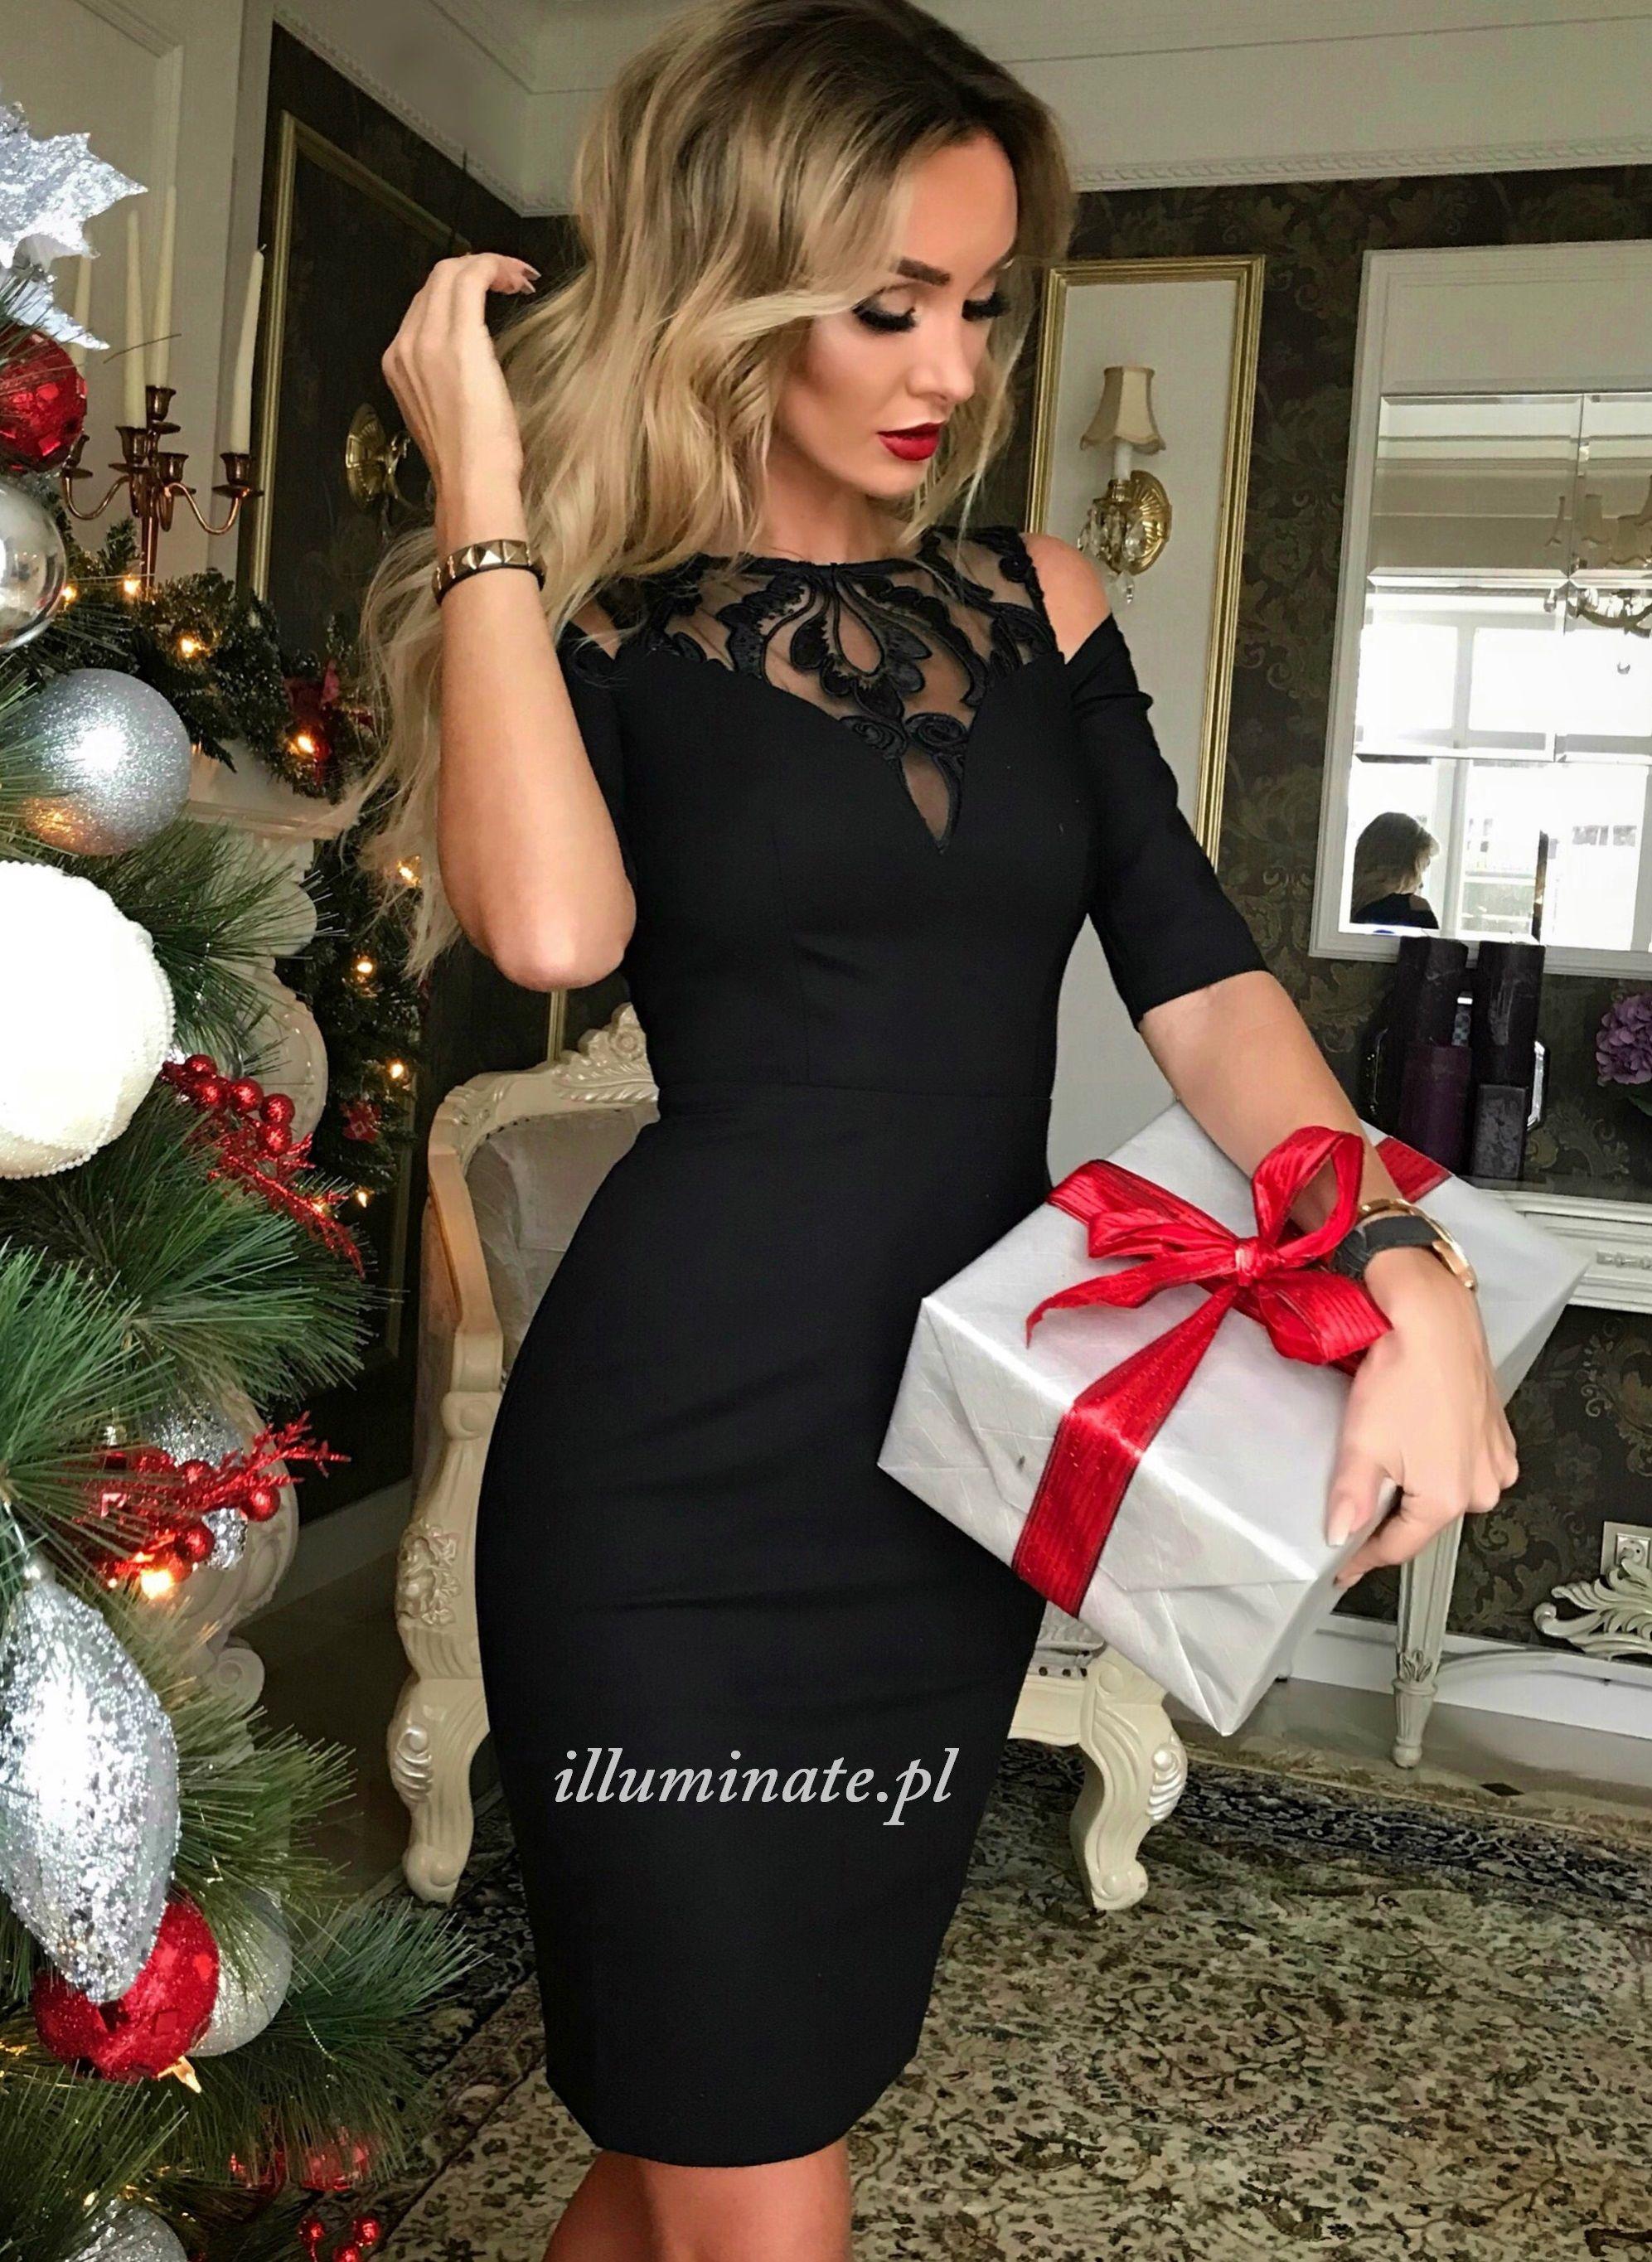 02a09a0b86 Little black dress Sukienka uszyta w Polsce. Made in Polnd. Buy-   illuminate.pl